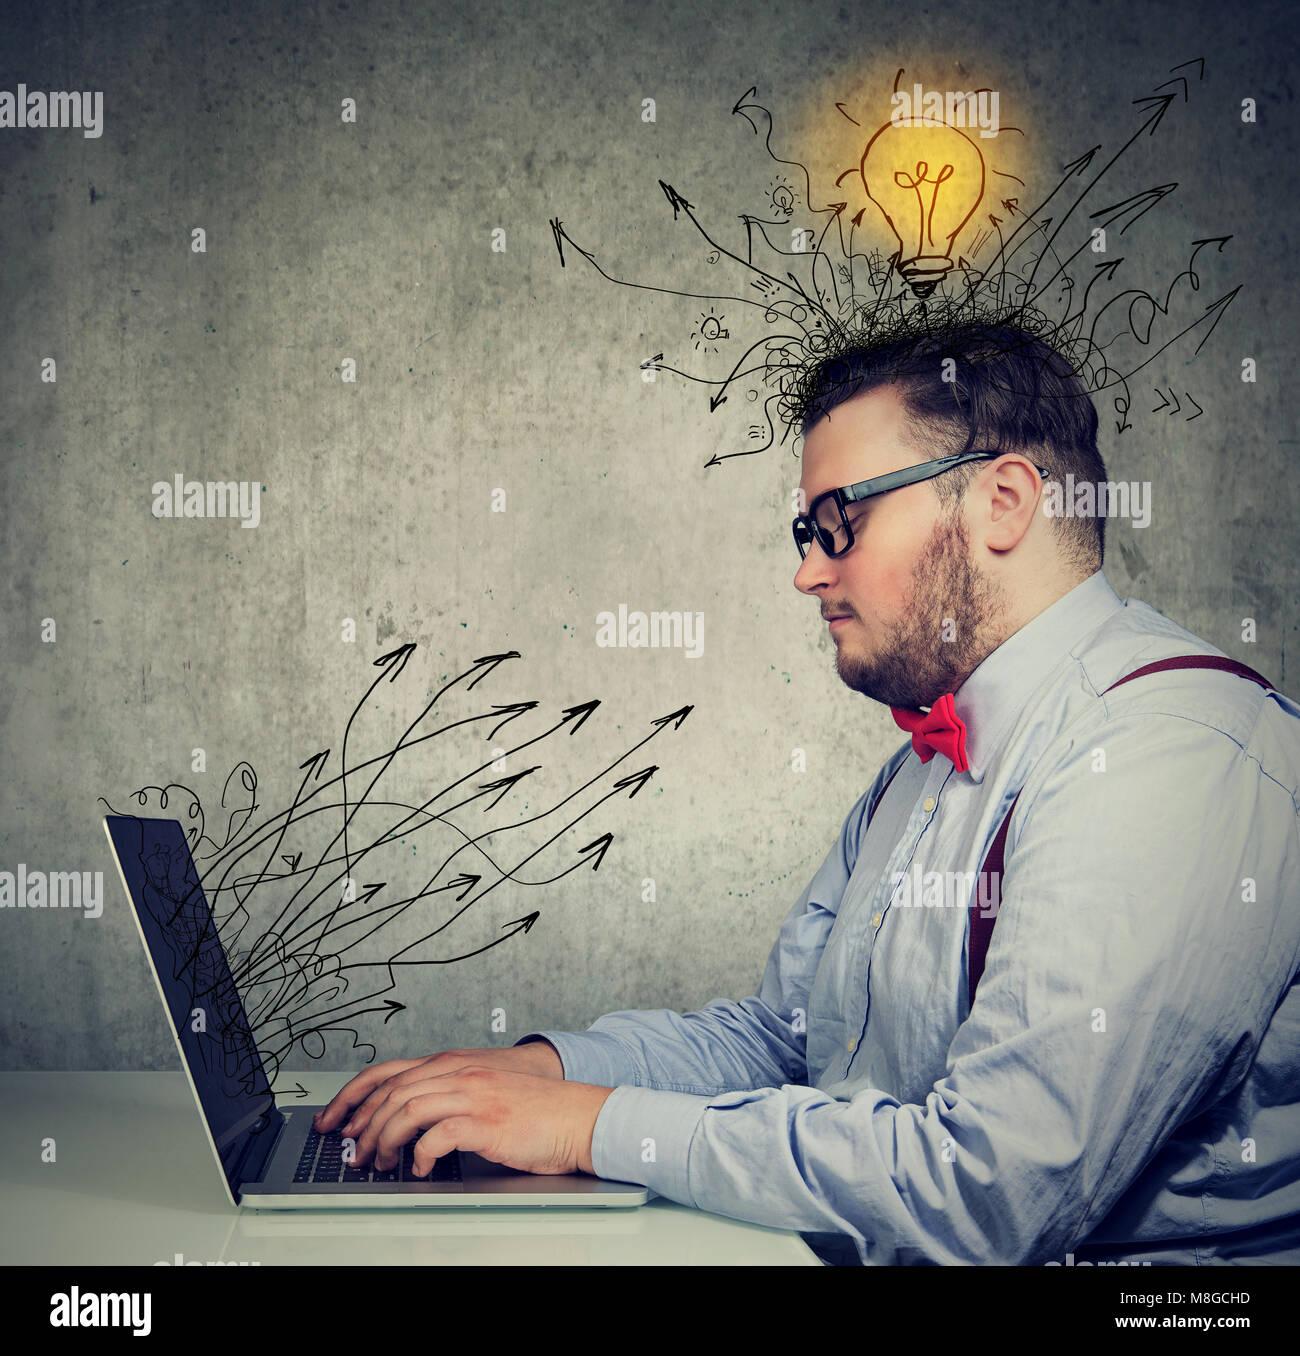 Junge Geschäftsmann Arbeiten am Laptop hat helle Ideen Stockbild